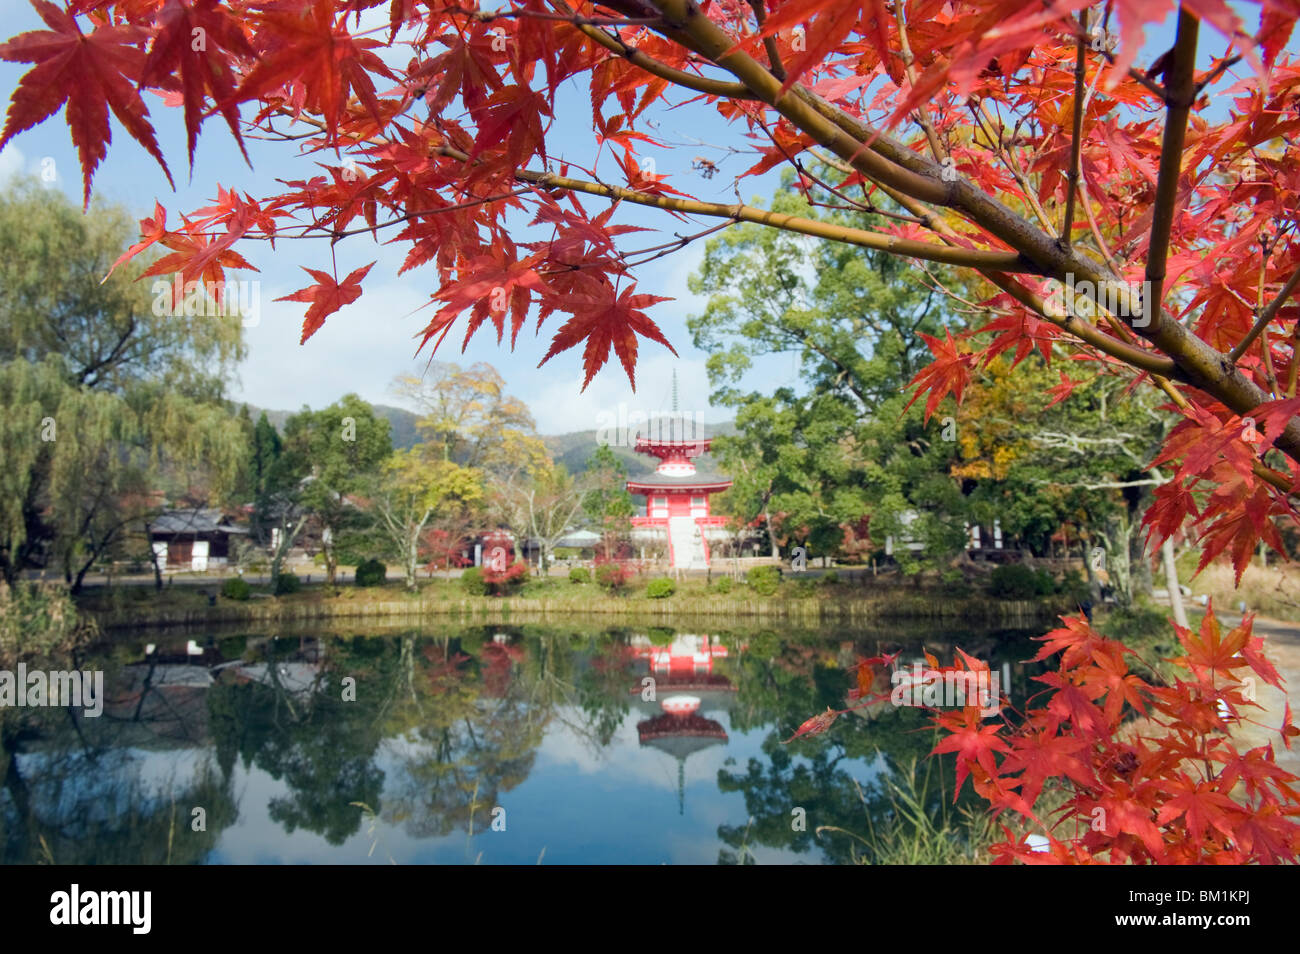 Pagoda on Osawa Pond, Daikaku ji (Daikakuji) Temple, dating from 876, Sagano area, Kyoto, Japan, Asia Stock Photo